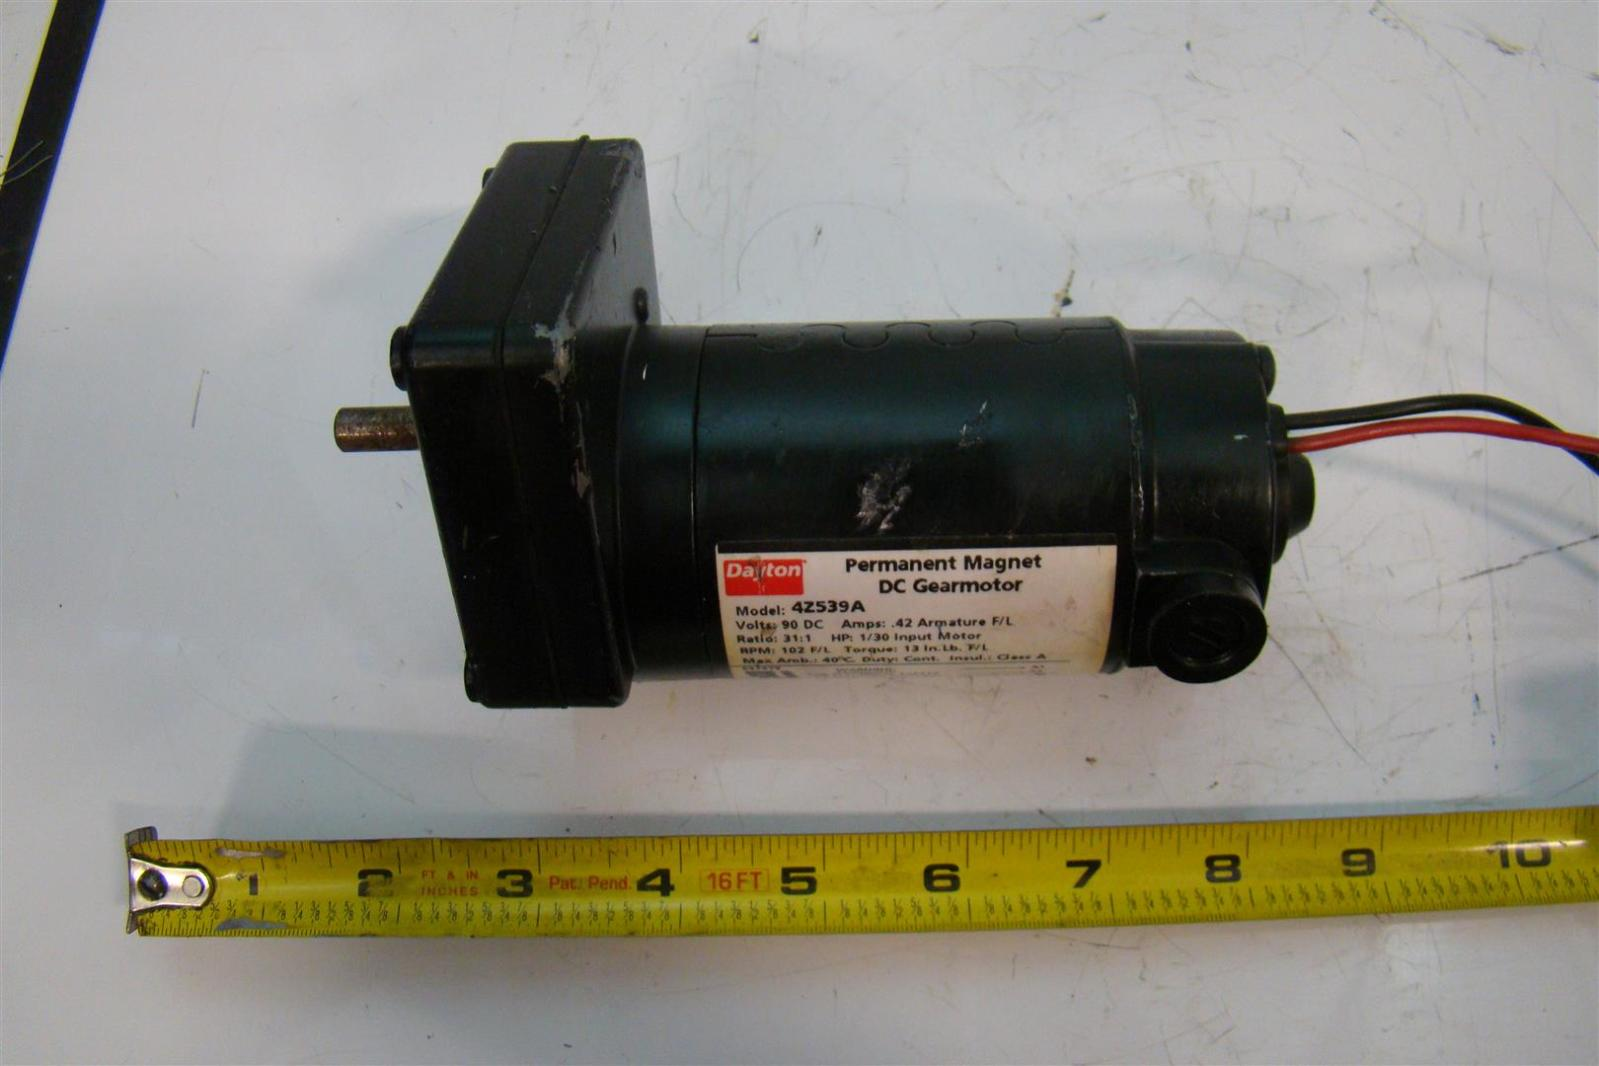 Dayton 4z539a Permanent Magnet Dc Gearmotor 90v Dc 1 30